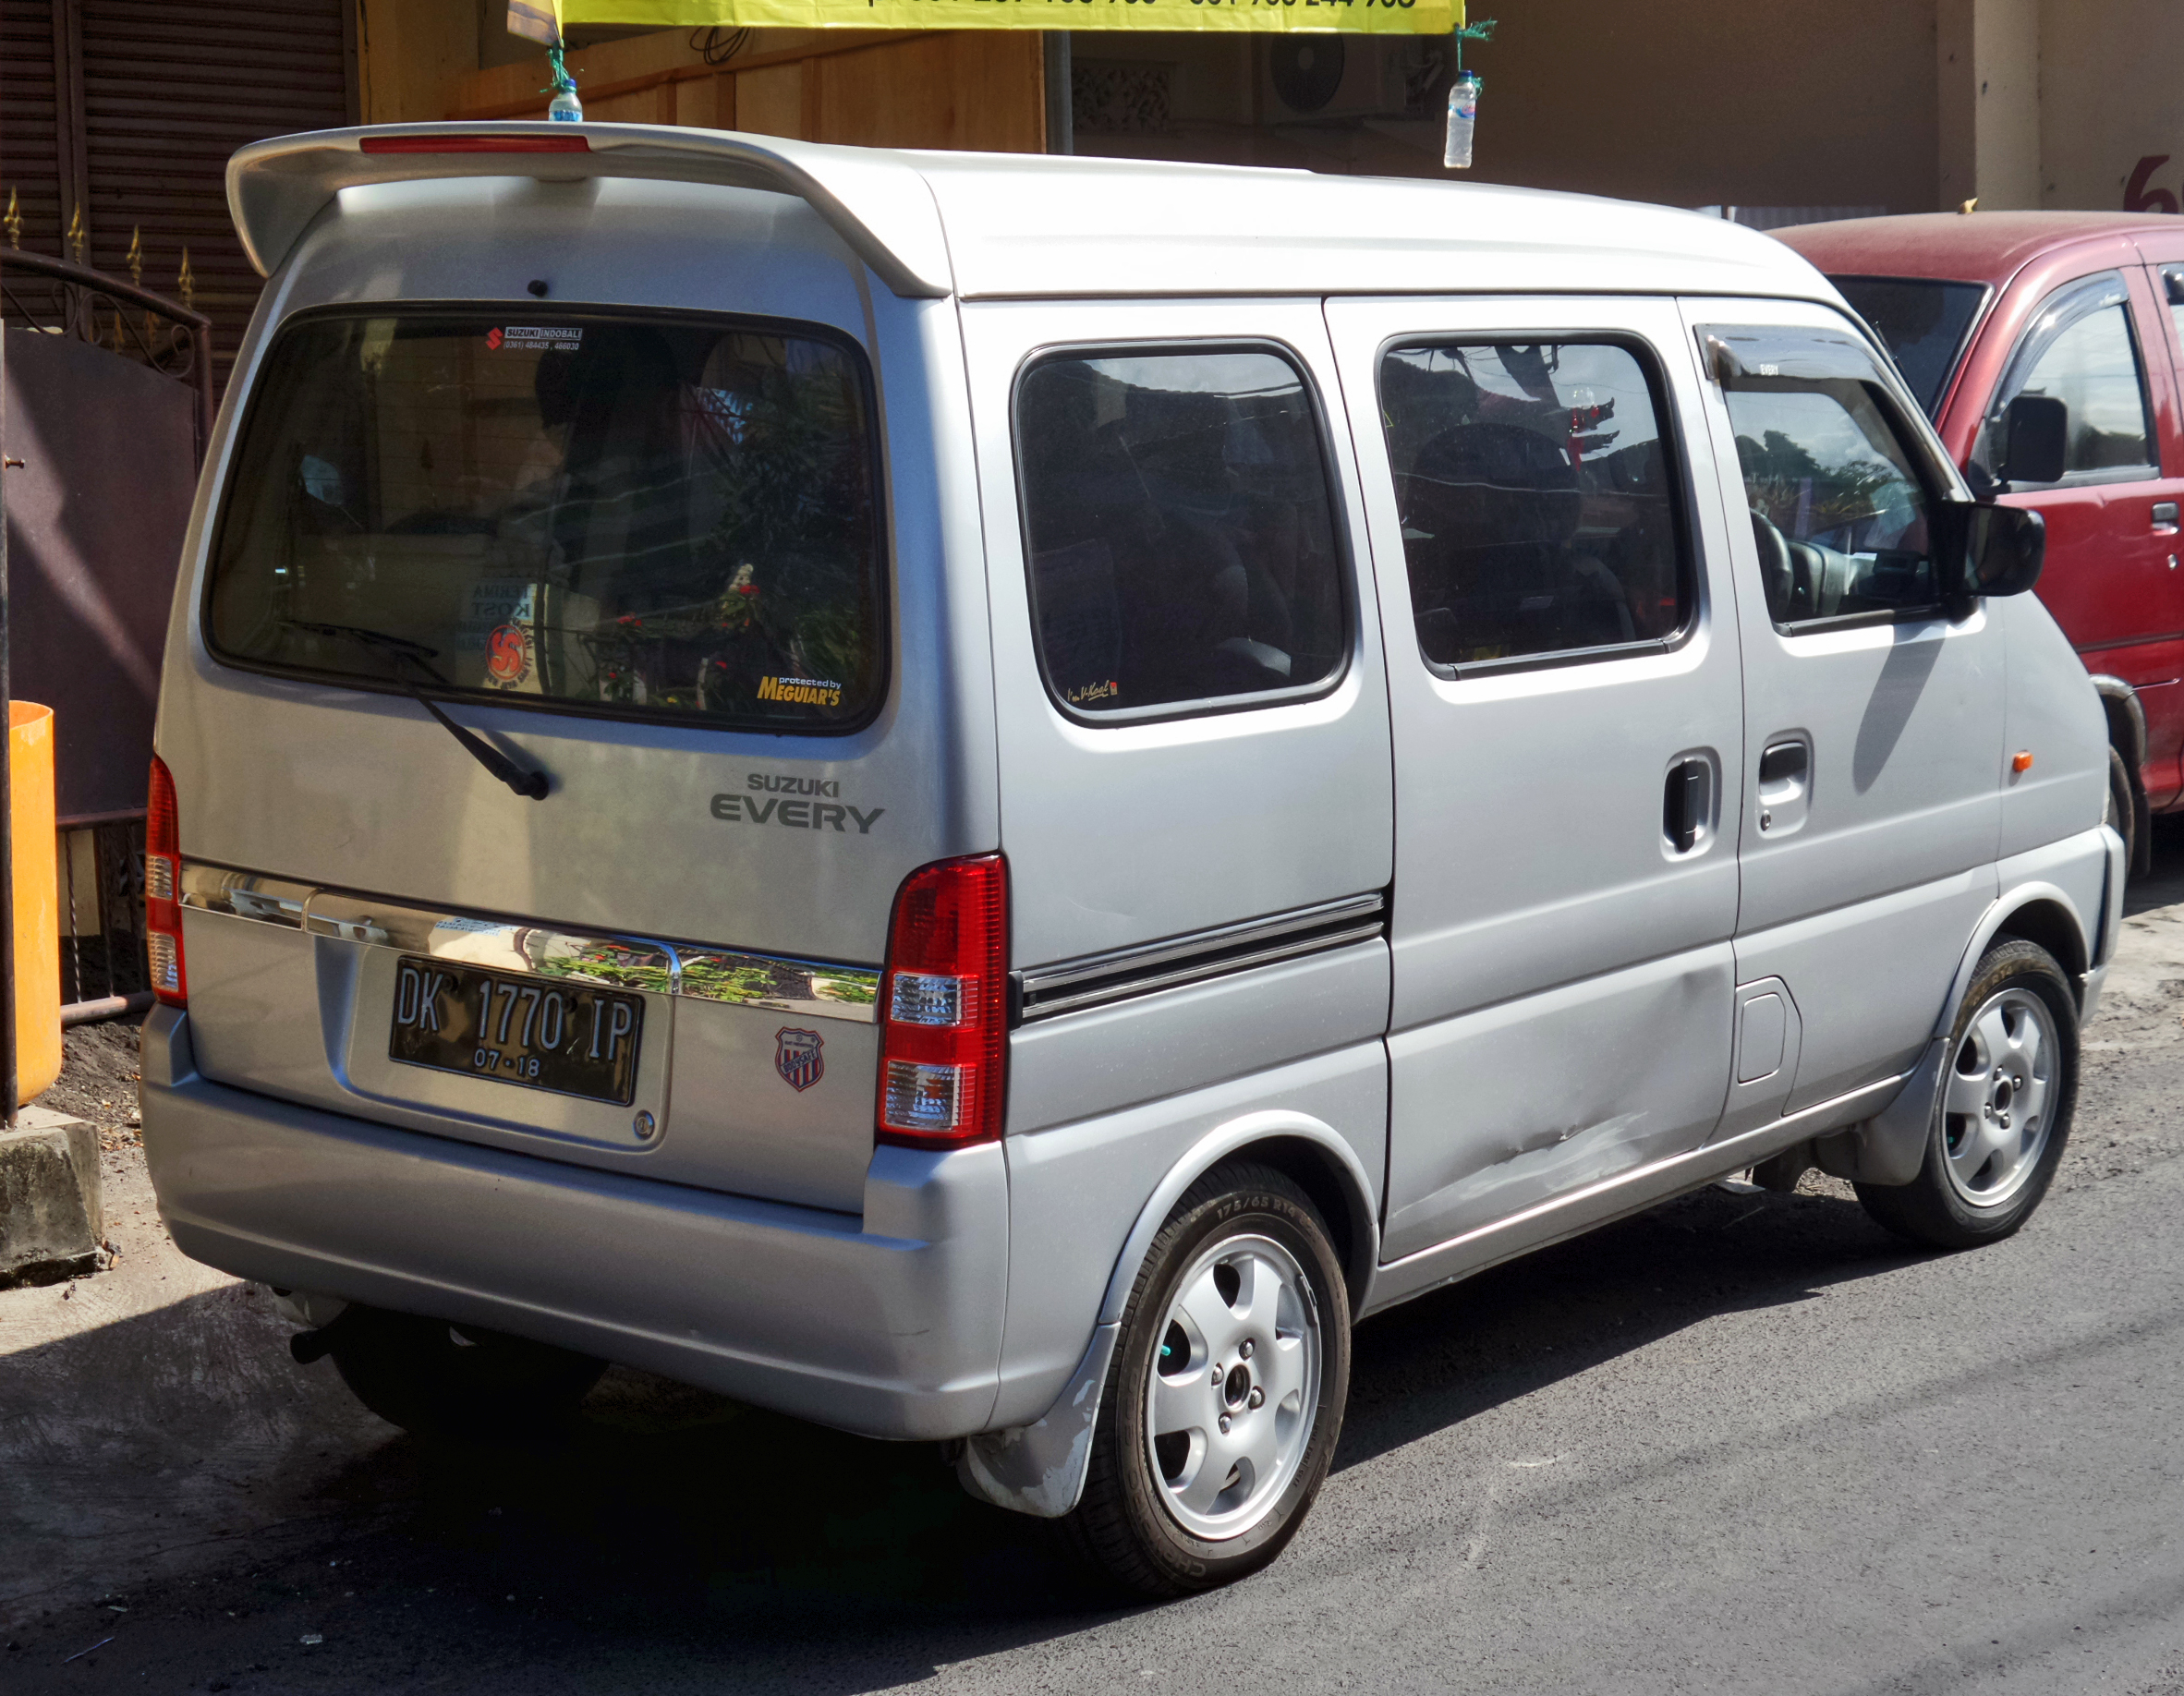 File:Suzuki Every (rear), Denpasar.jpg